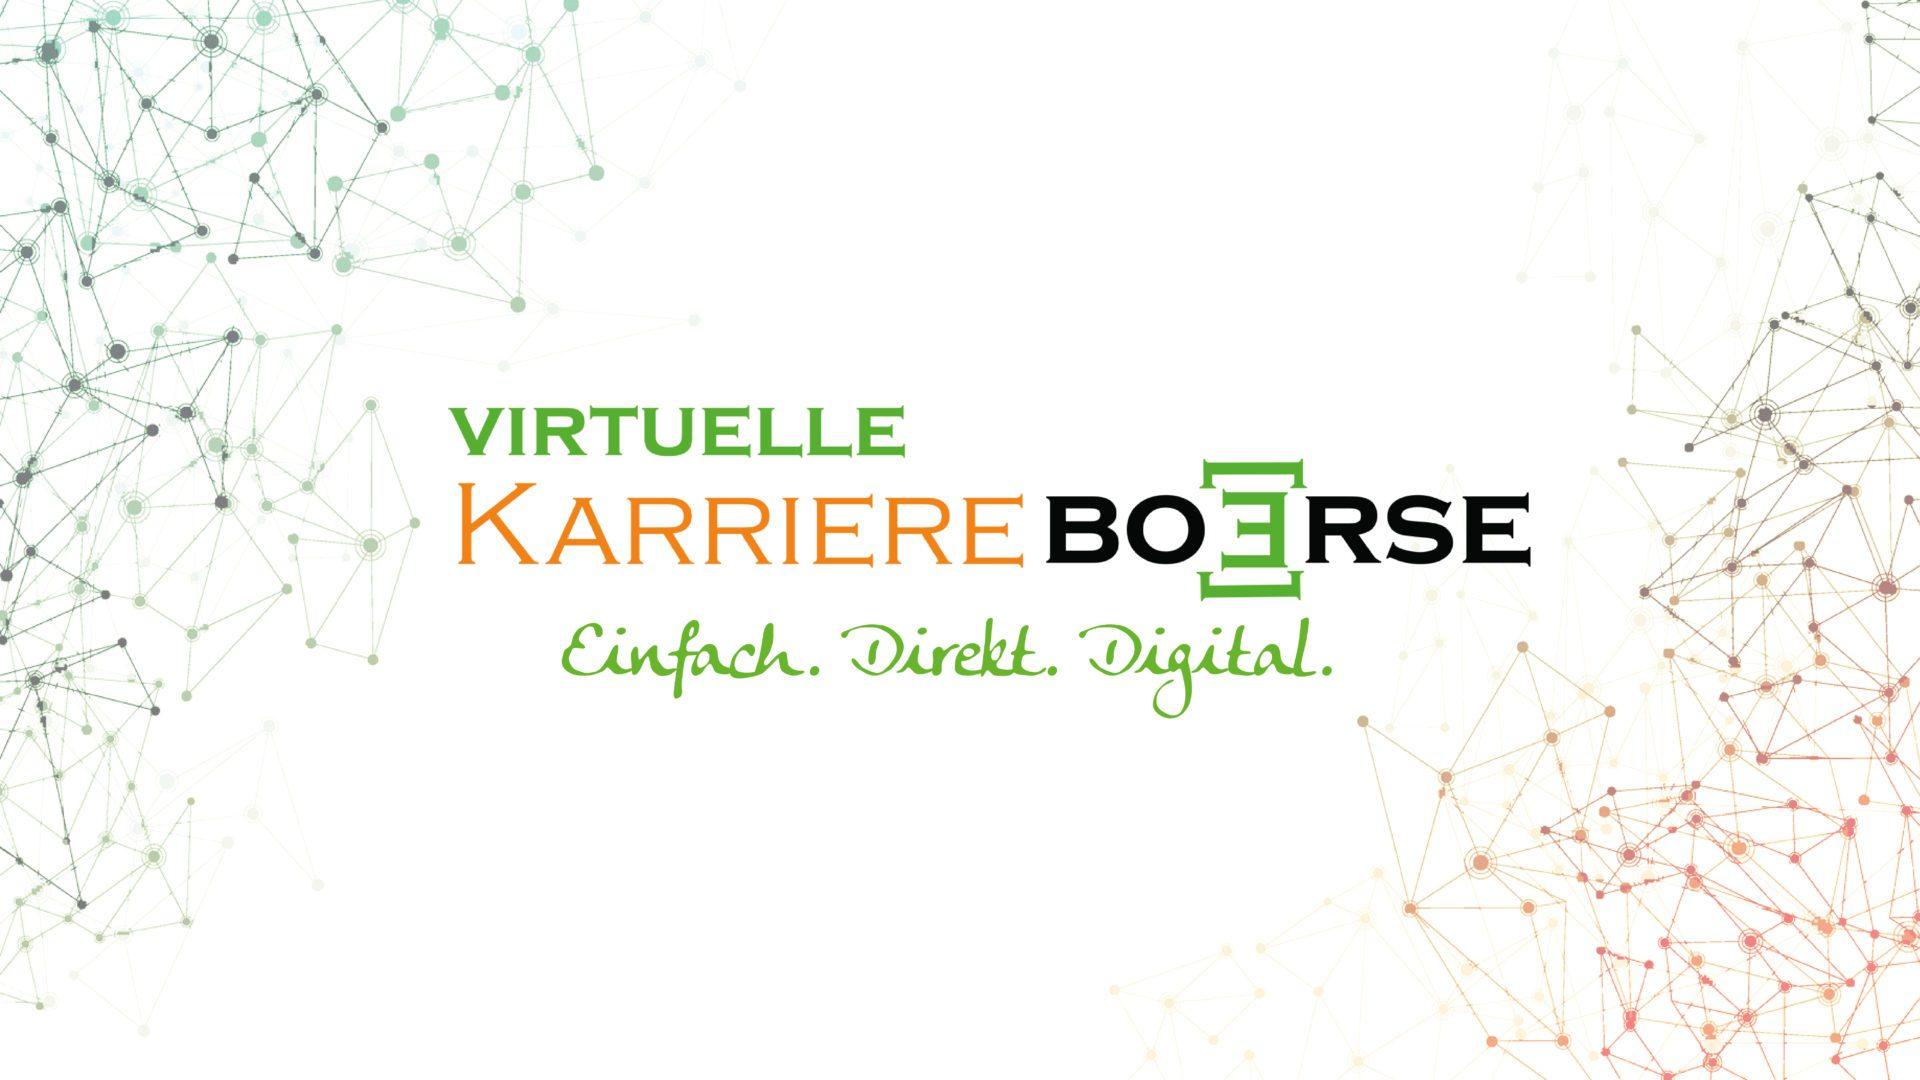 Virtuelle Karrieremesse am 30. September